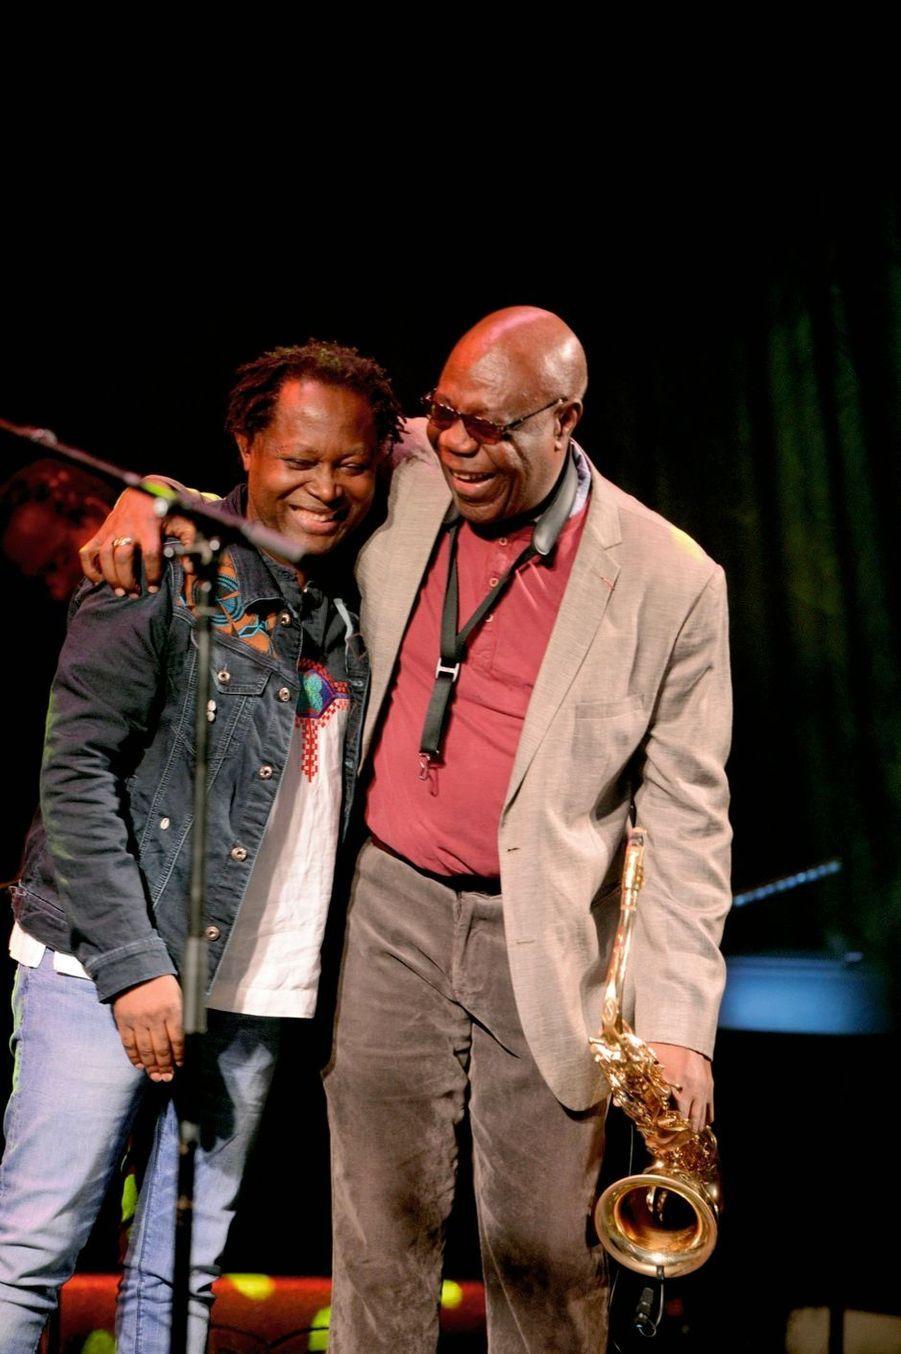 Avec le chanteur congolais Lokua Kanza.